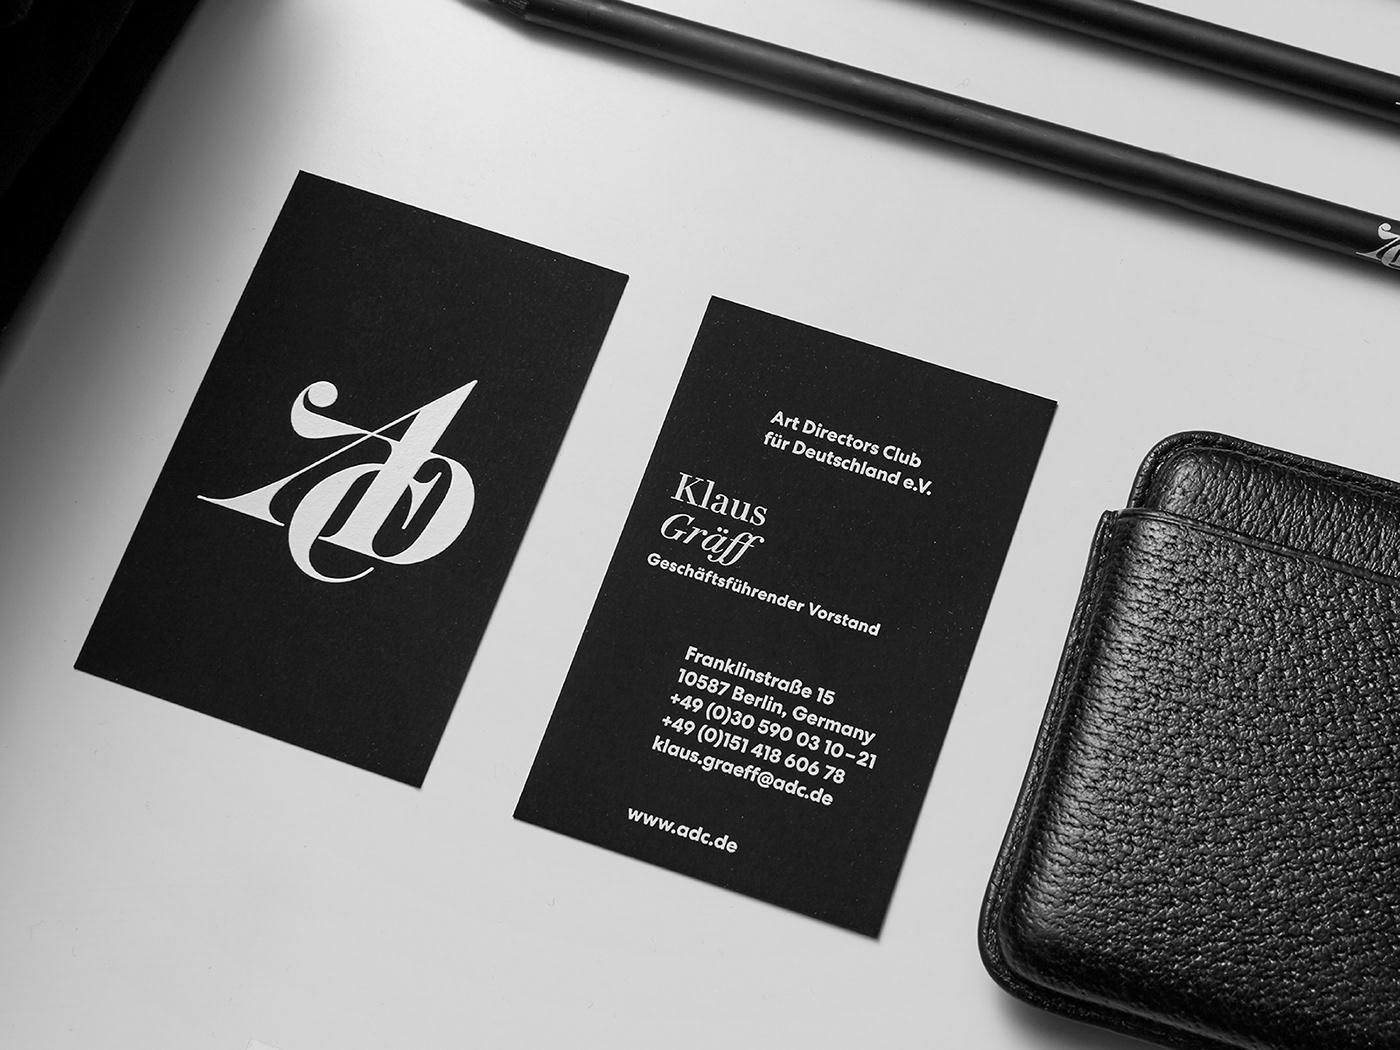 rebranding Art Directors Club logo Stationery editorial design  branding  Interface merchandise